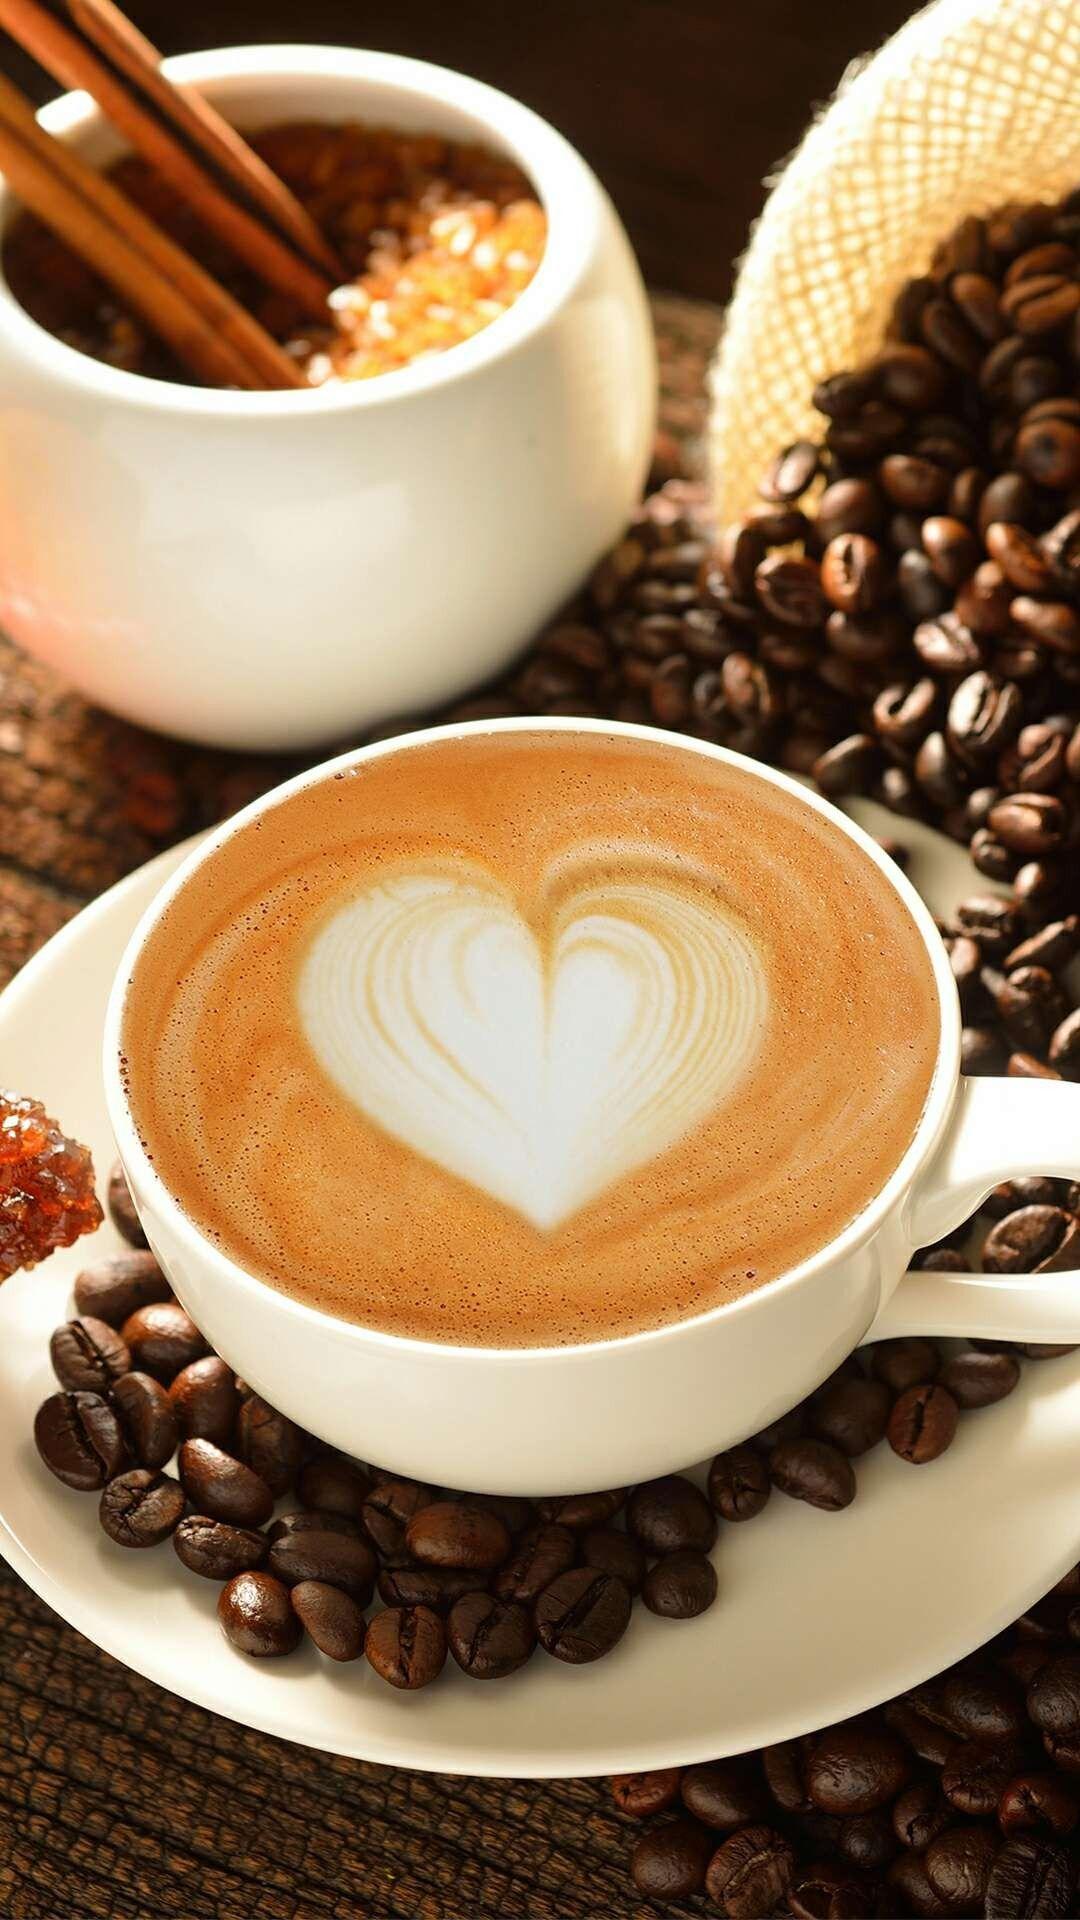 плохо без чашка ароматного кофе картинки полки все чаще